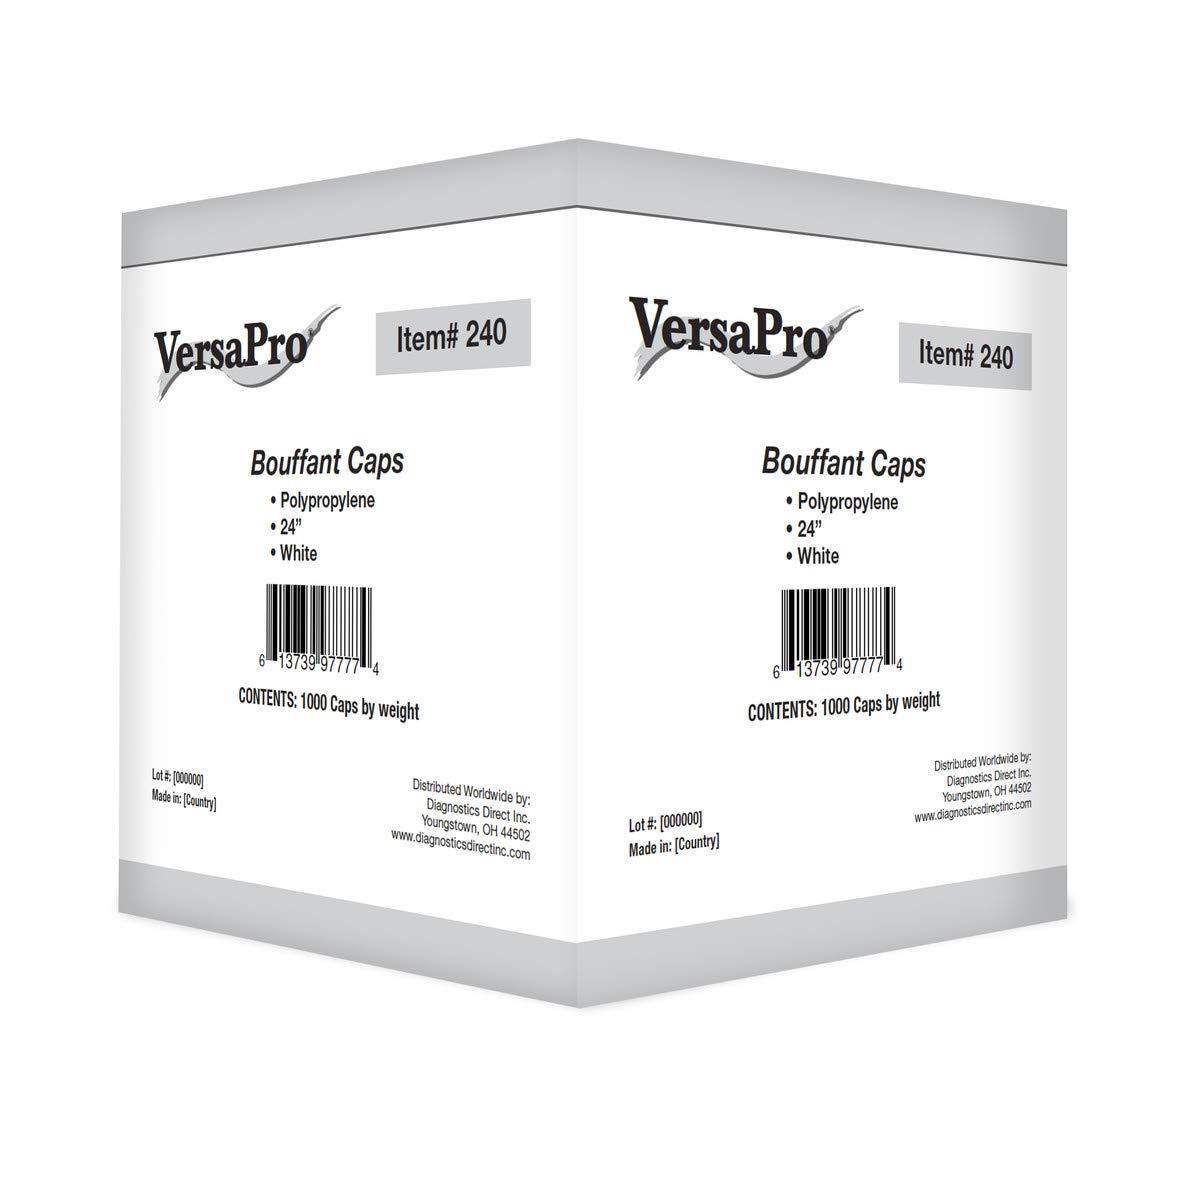 VersaPro 240 24'' Disposable Hair Net, Polypropylene, White 100/Sleeve (Case of 1000)